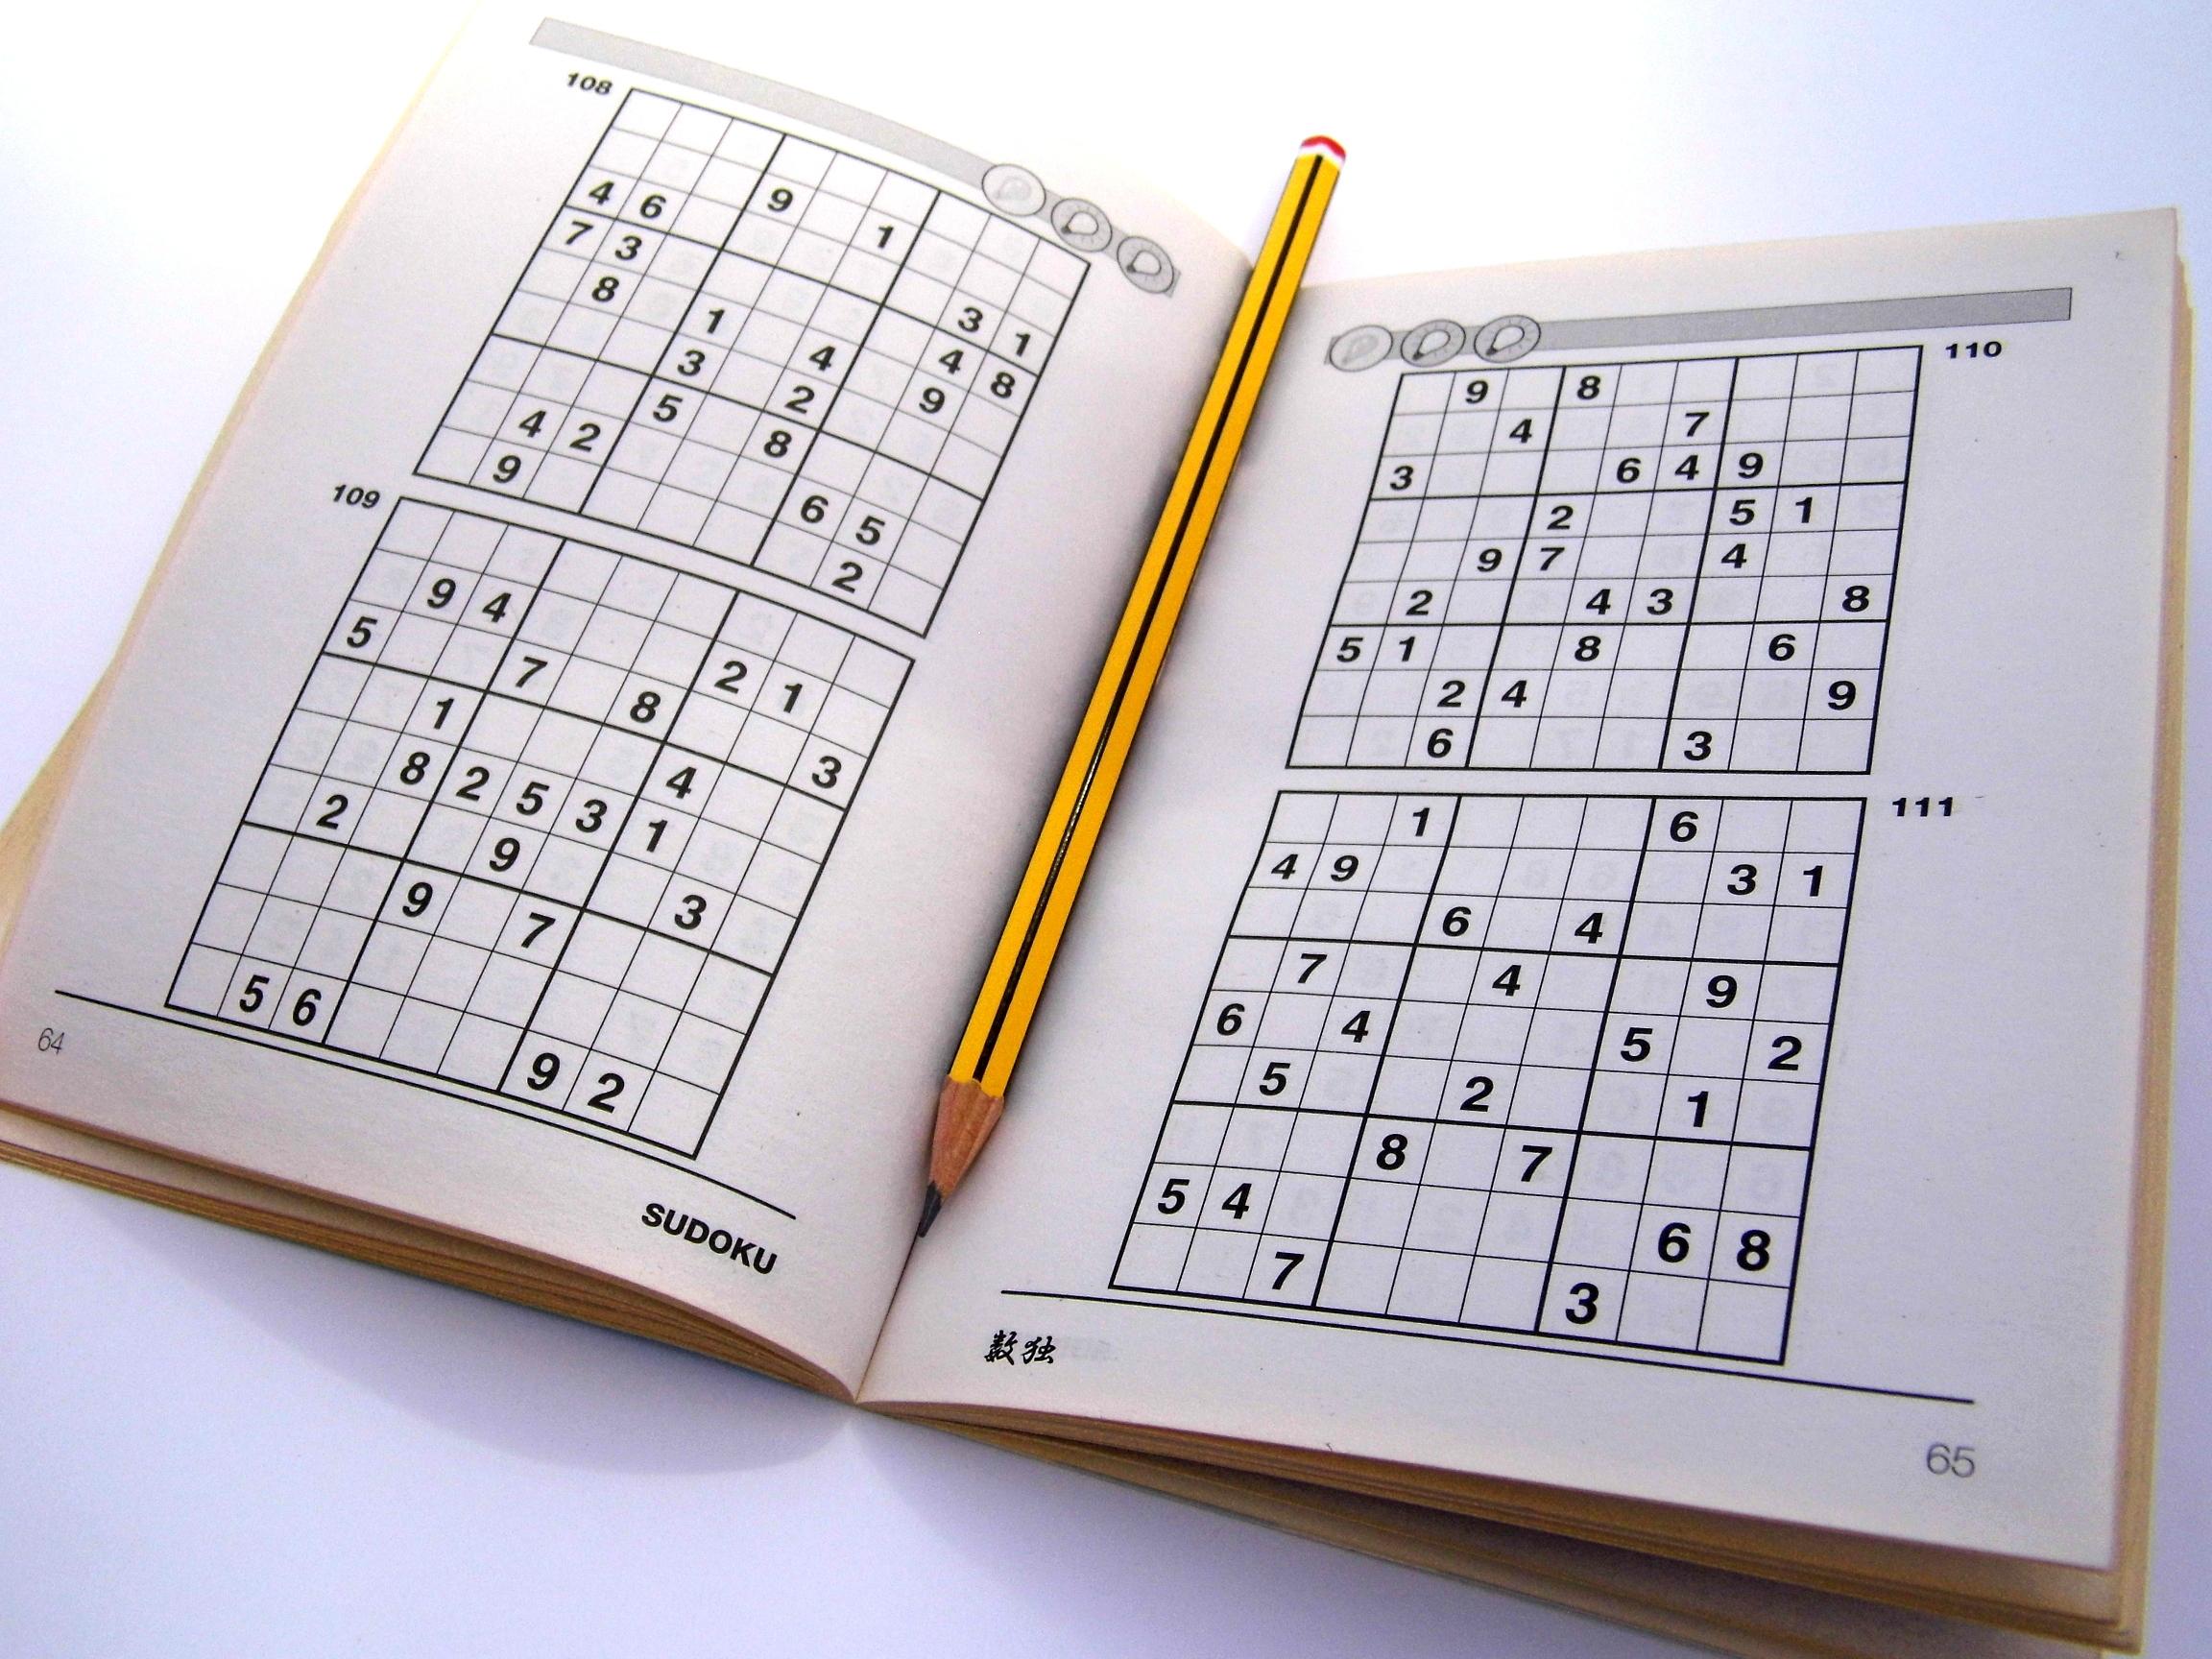 Free Sudoku Puzzles – Free Sudoku Puzzles From Easy To Evil Level - Free Printable Sudoku 6 Per Page